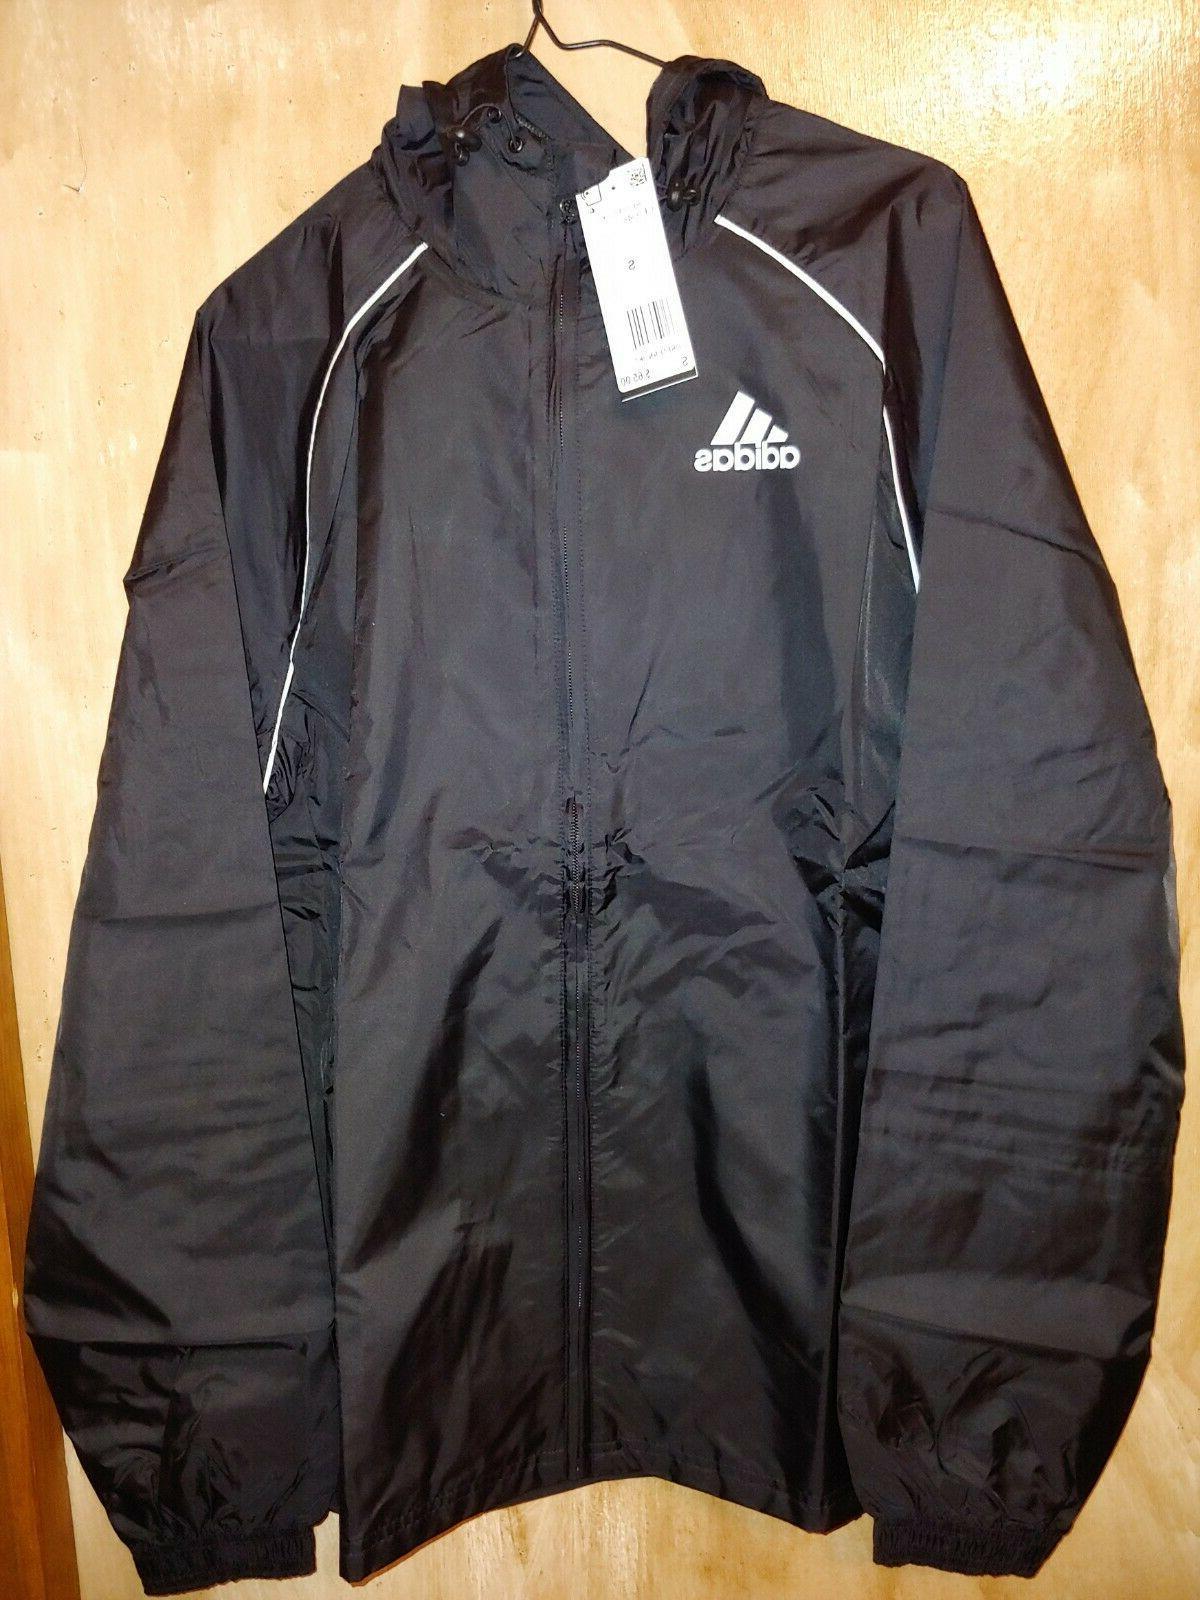 cee07087c11d4 Adidas Core 18 Rain Jacket Windbreaker ...